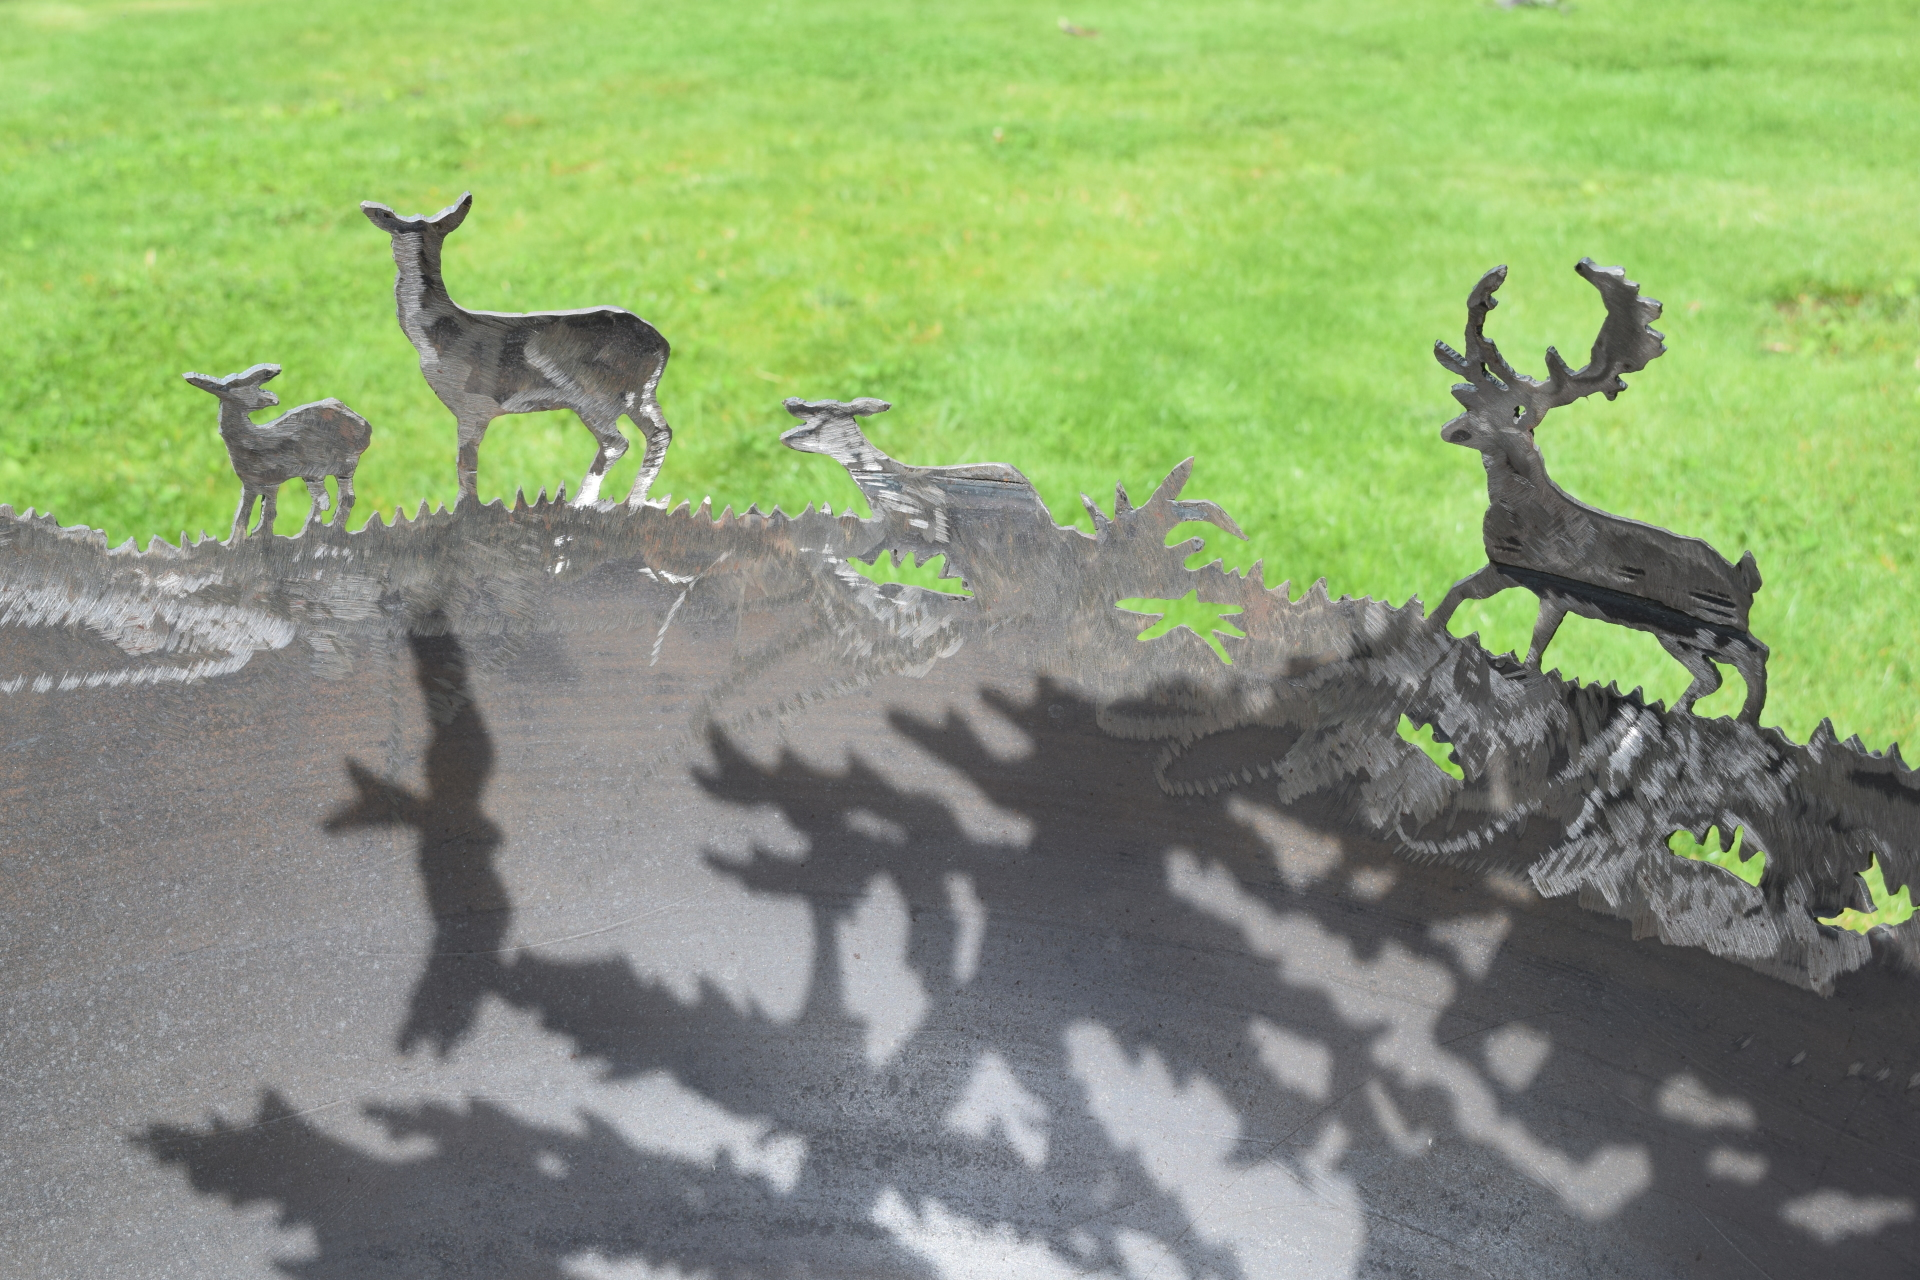 Deer and Kite